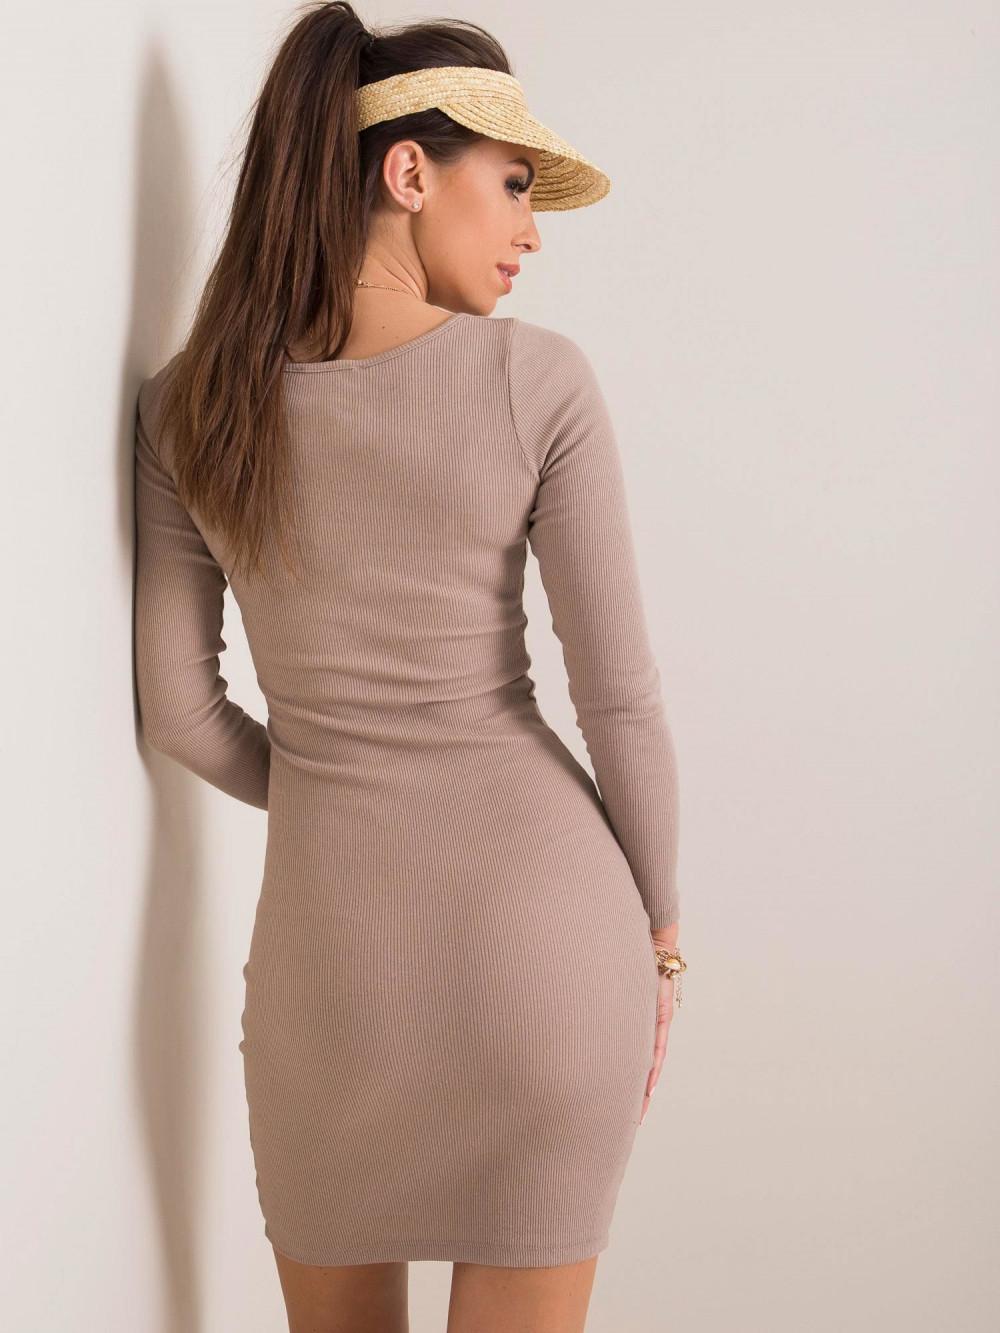 Ciemnobeżowa dopasowana sukienka O-Neck Acera 2